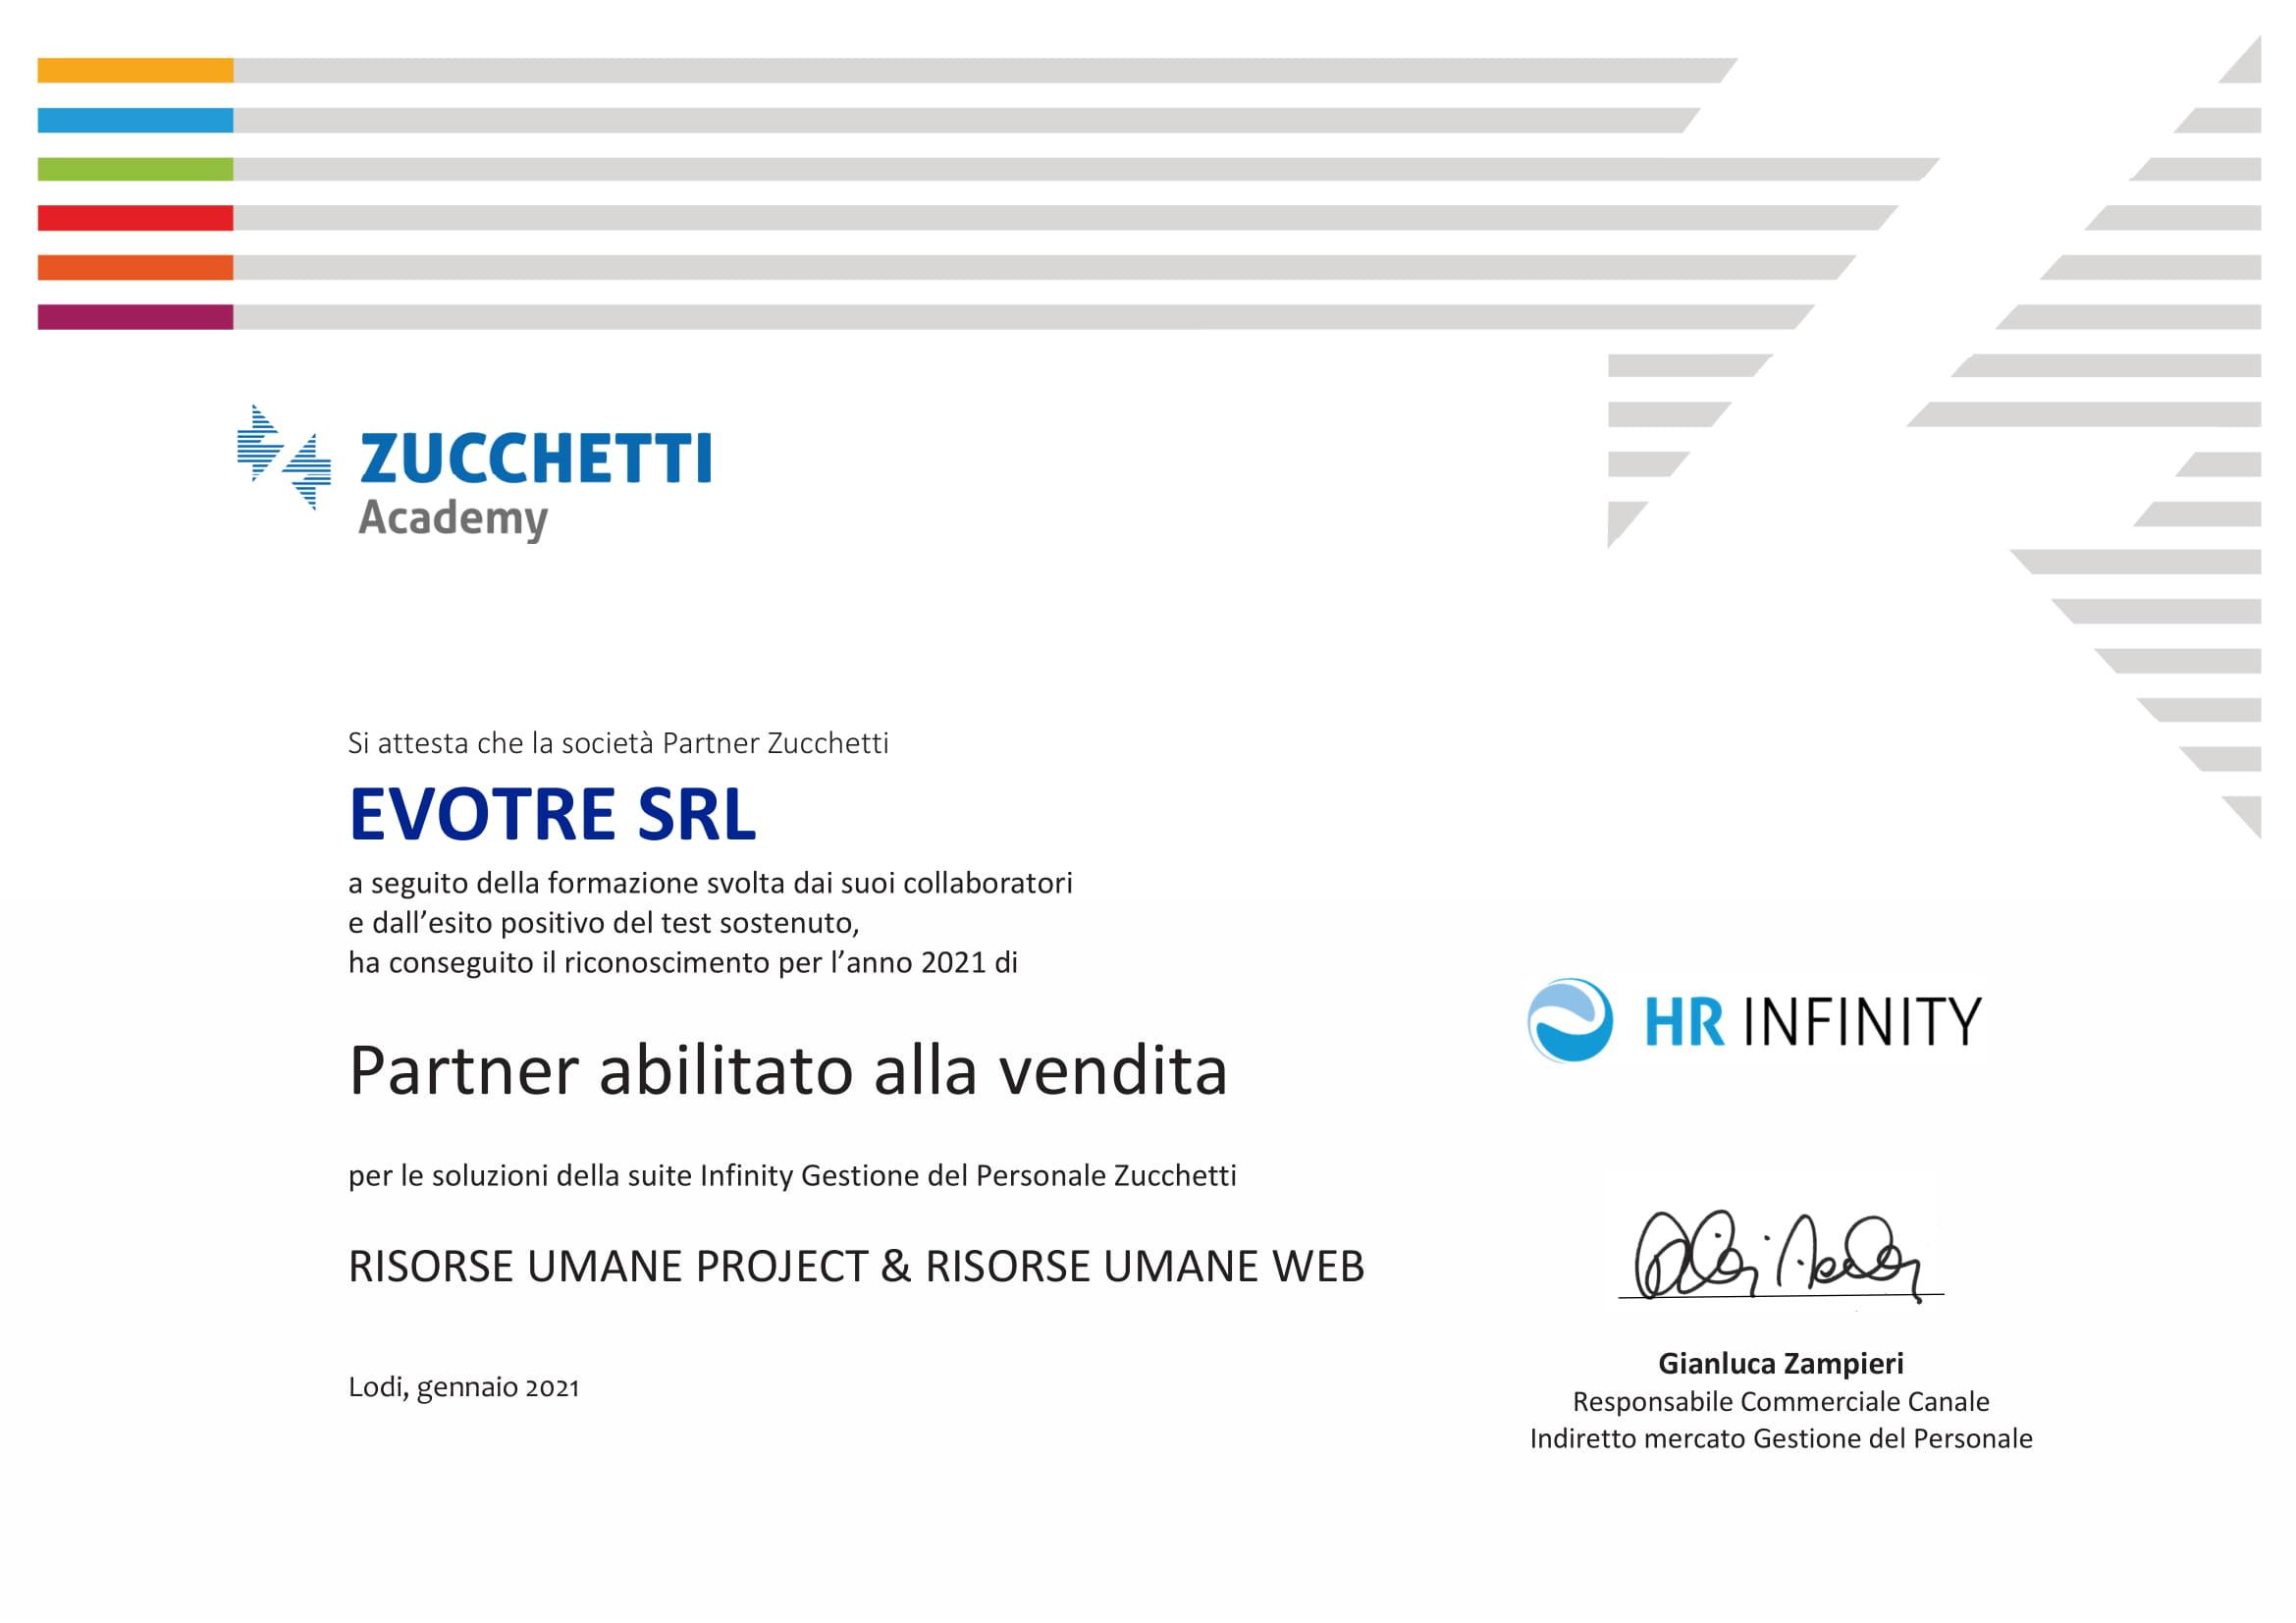 HR Infinity